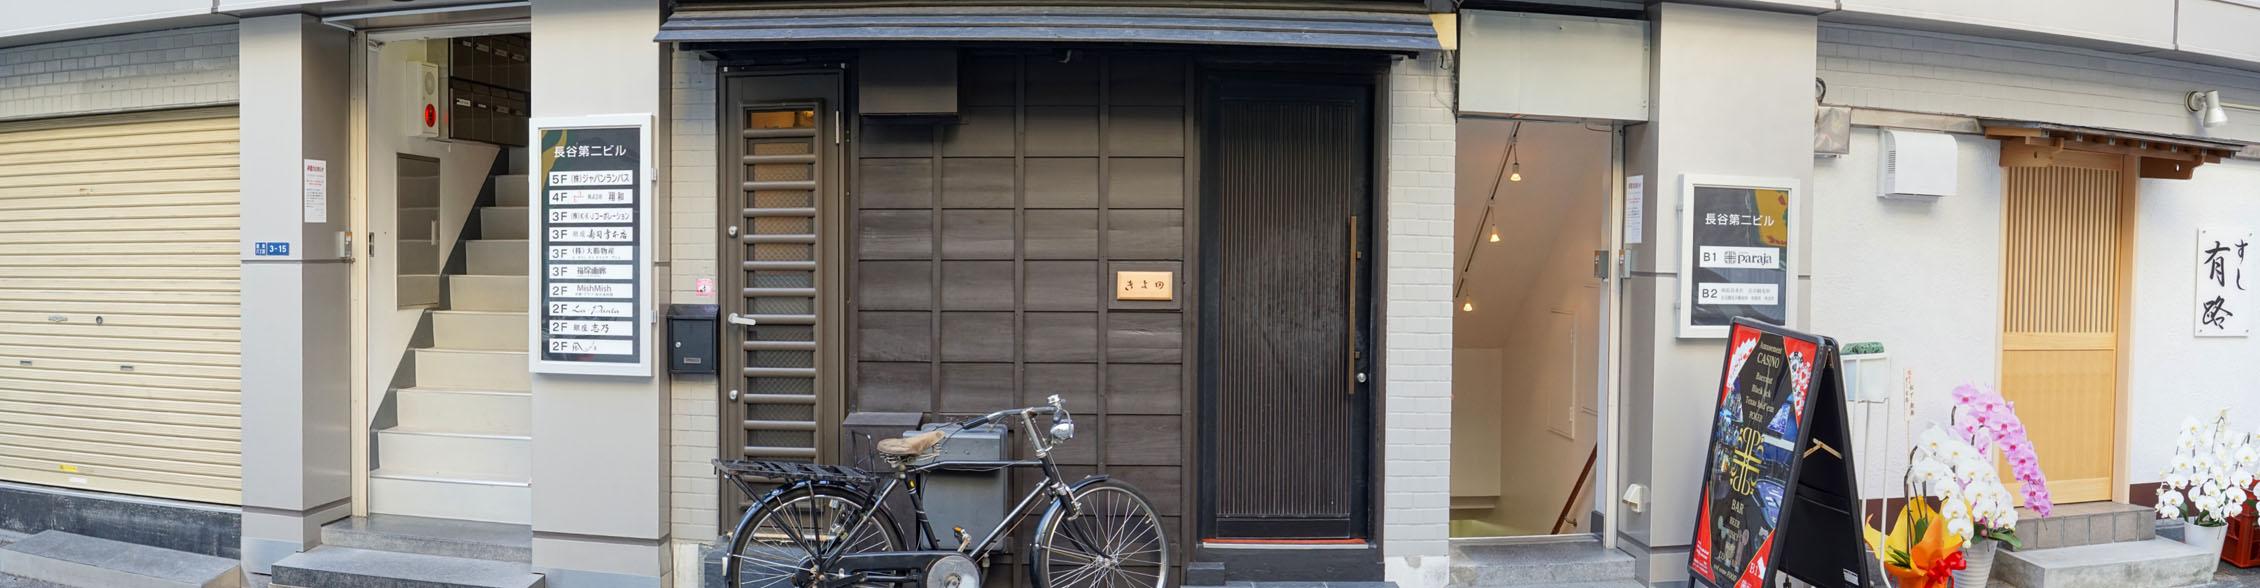 Kiyota Exterior